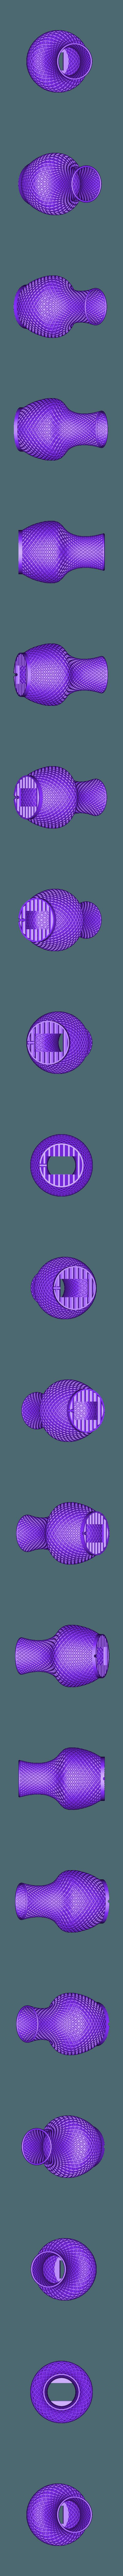 spirals5.stl Download free STL file Spirals 4 and 5 • 3D printing model, Birk